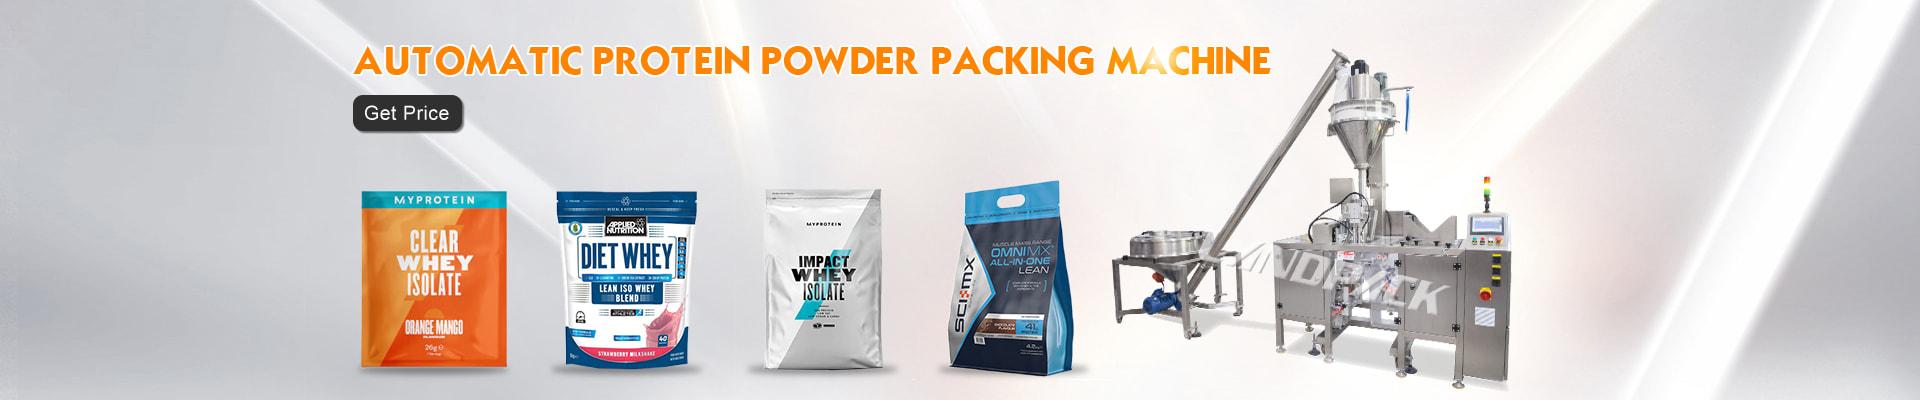 Protein Powder Packing Machine